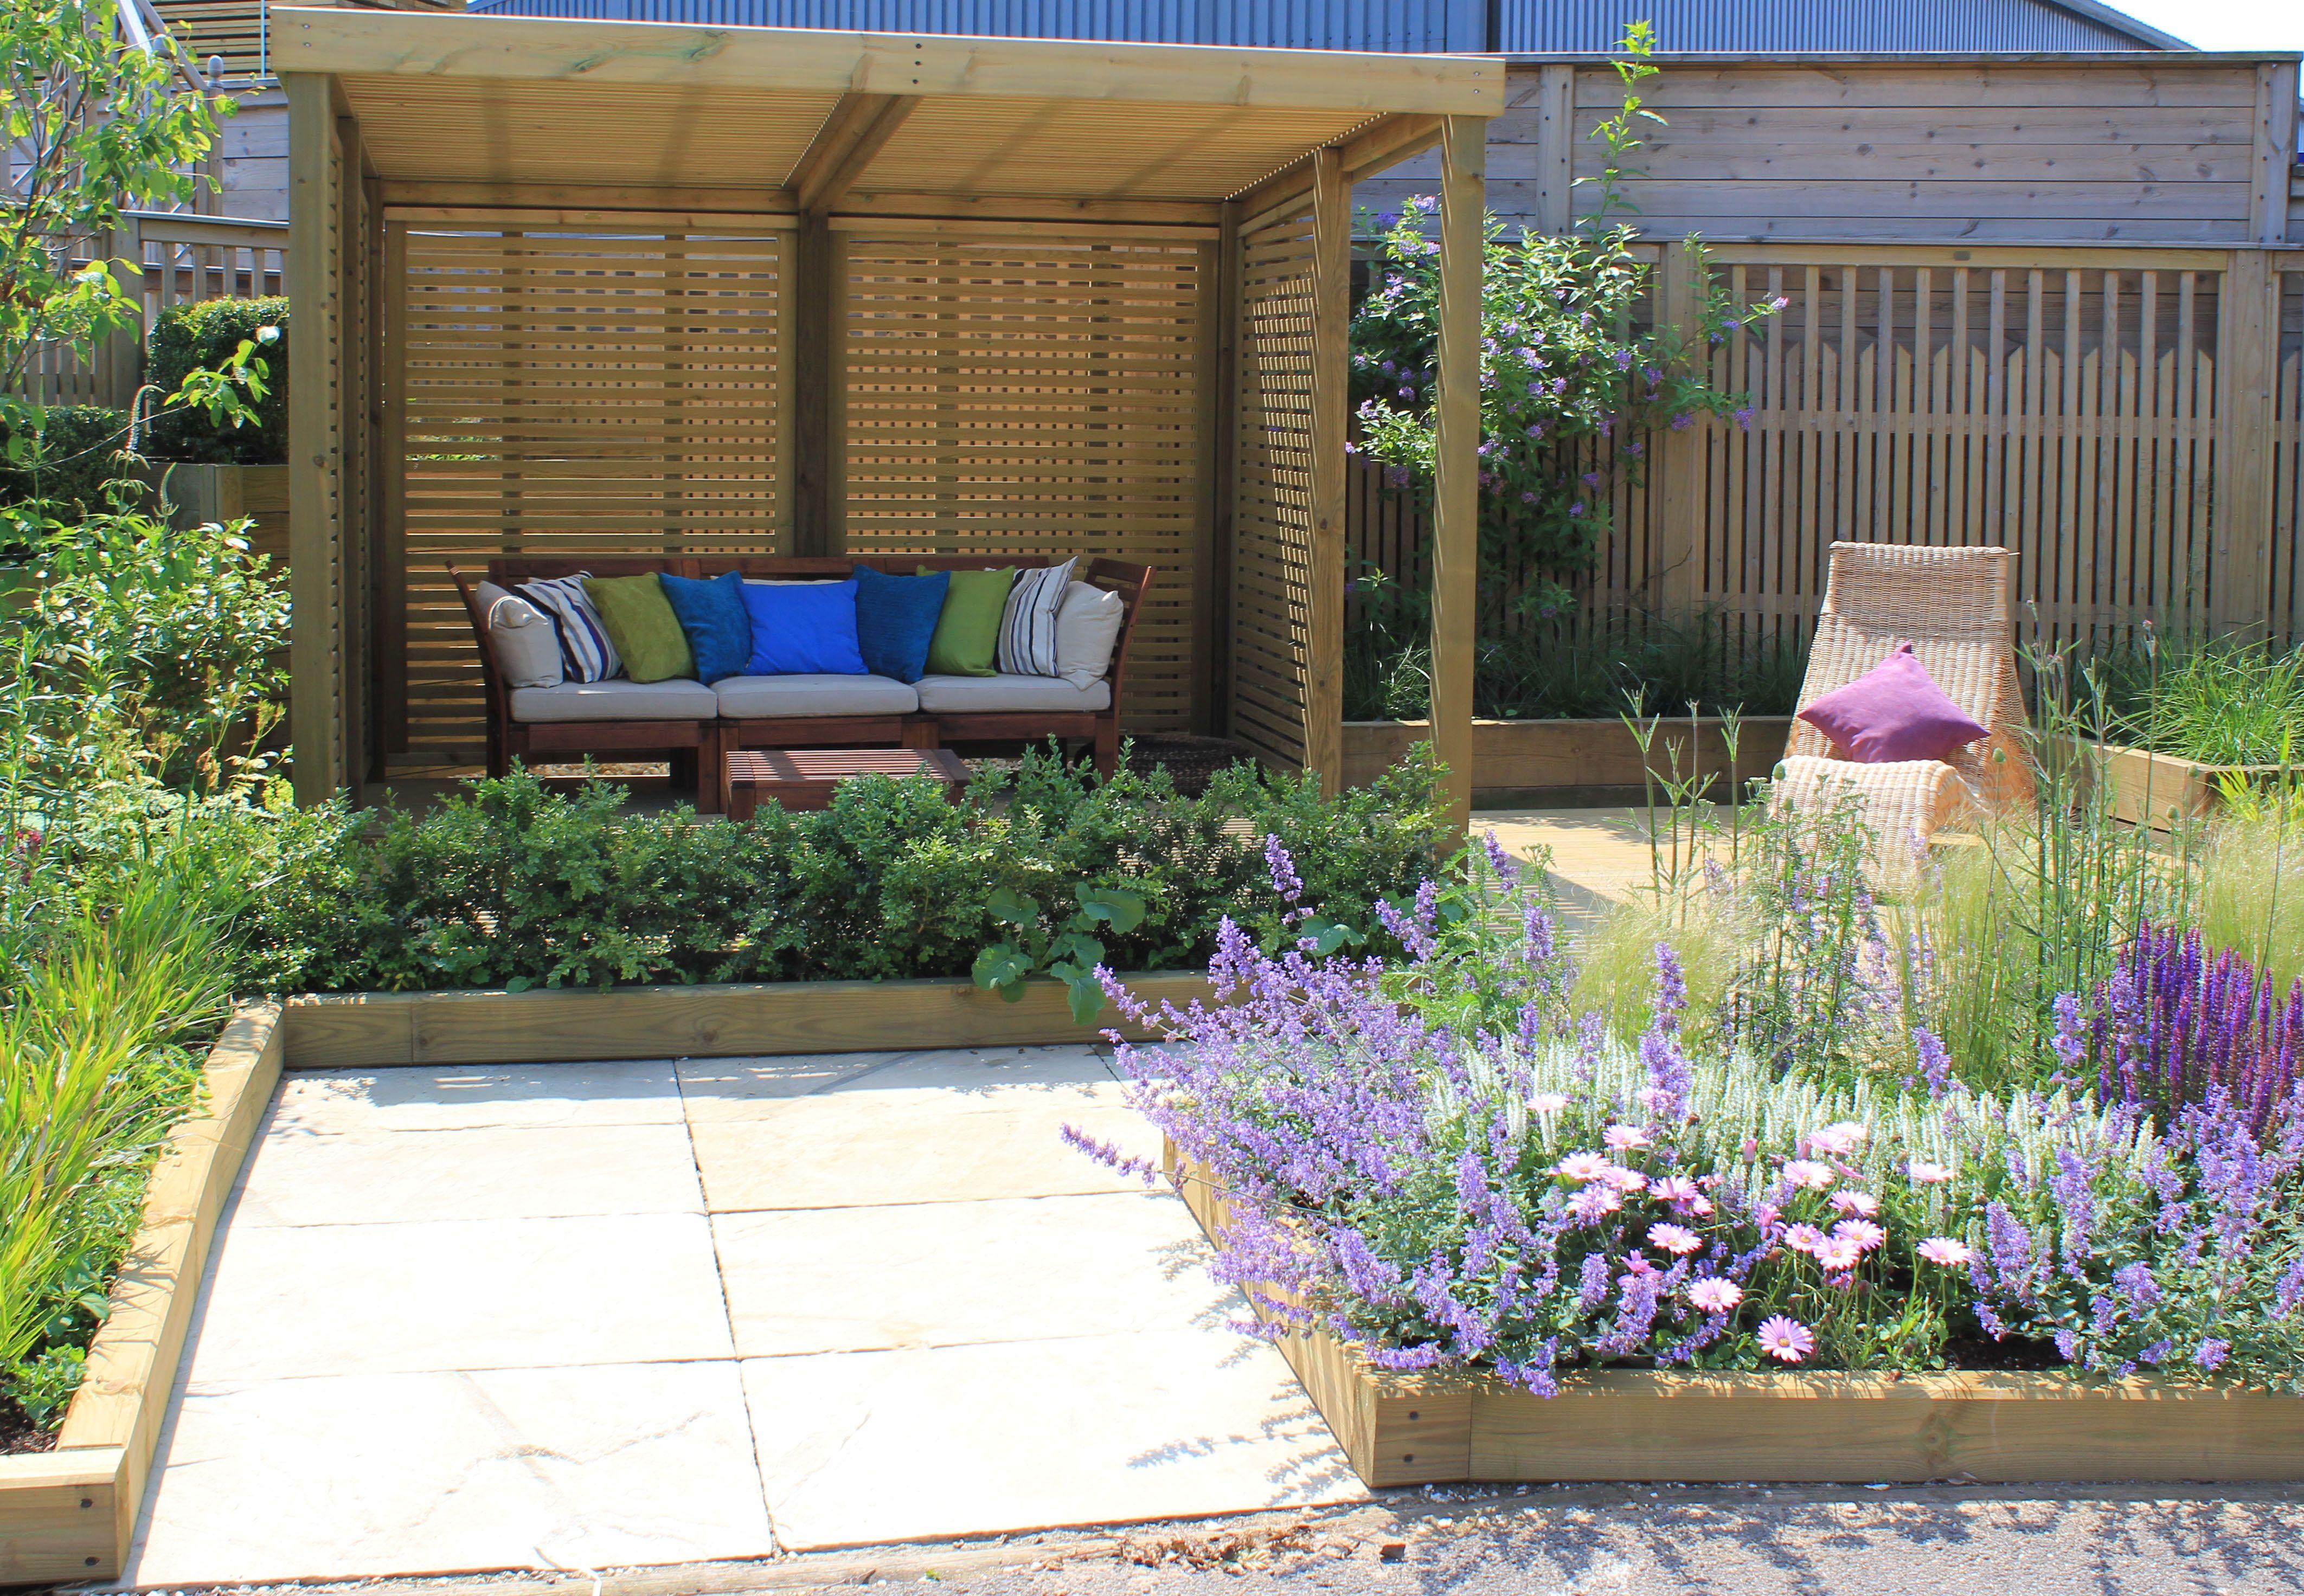 The Sanctuary Garden By Joanne Winn Featuring The Timber Retreat Garden  Shelter #showgarden #design